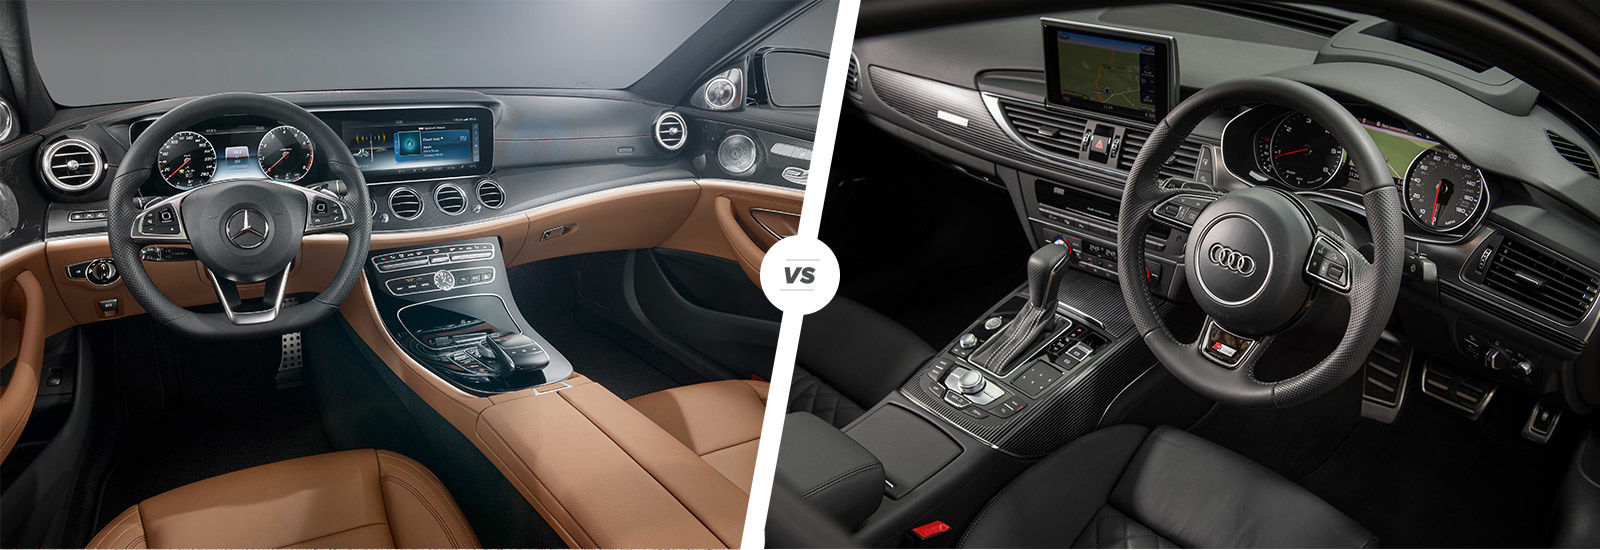 Mercedes EClass vs Audi A6 comparison  carwow